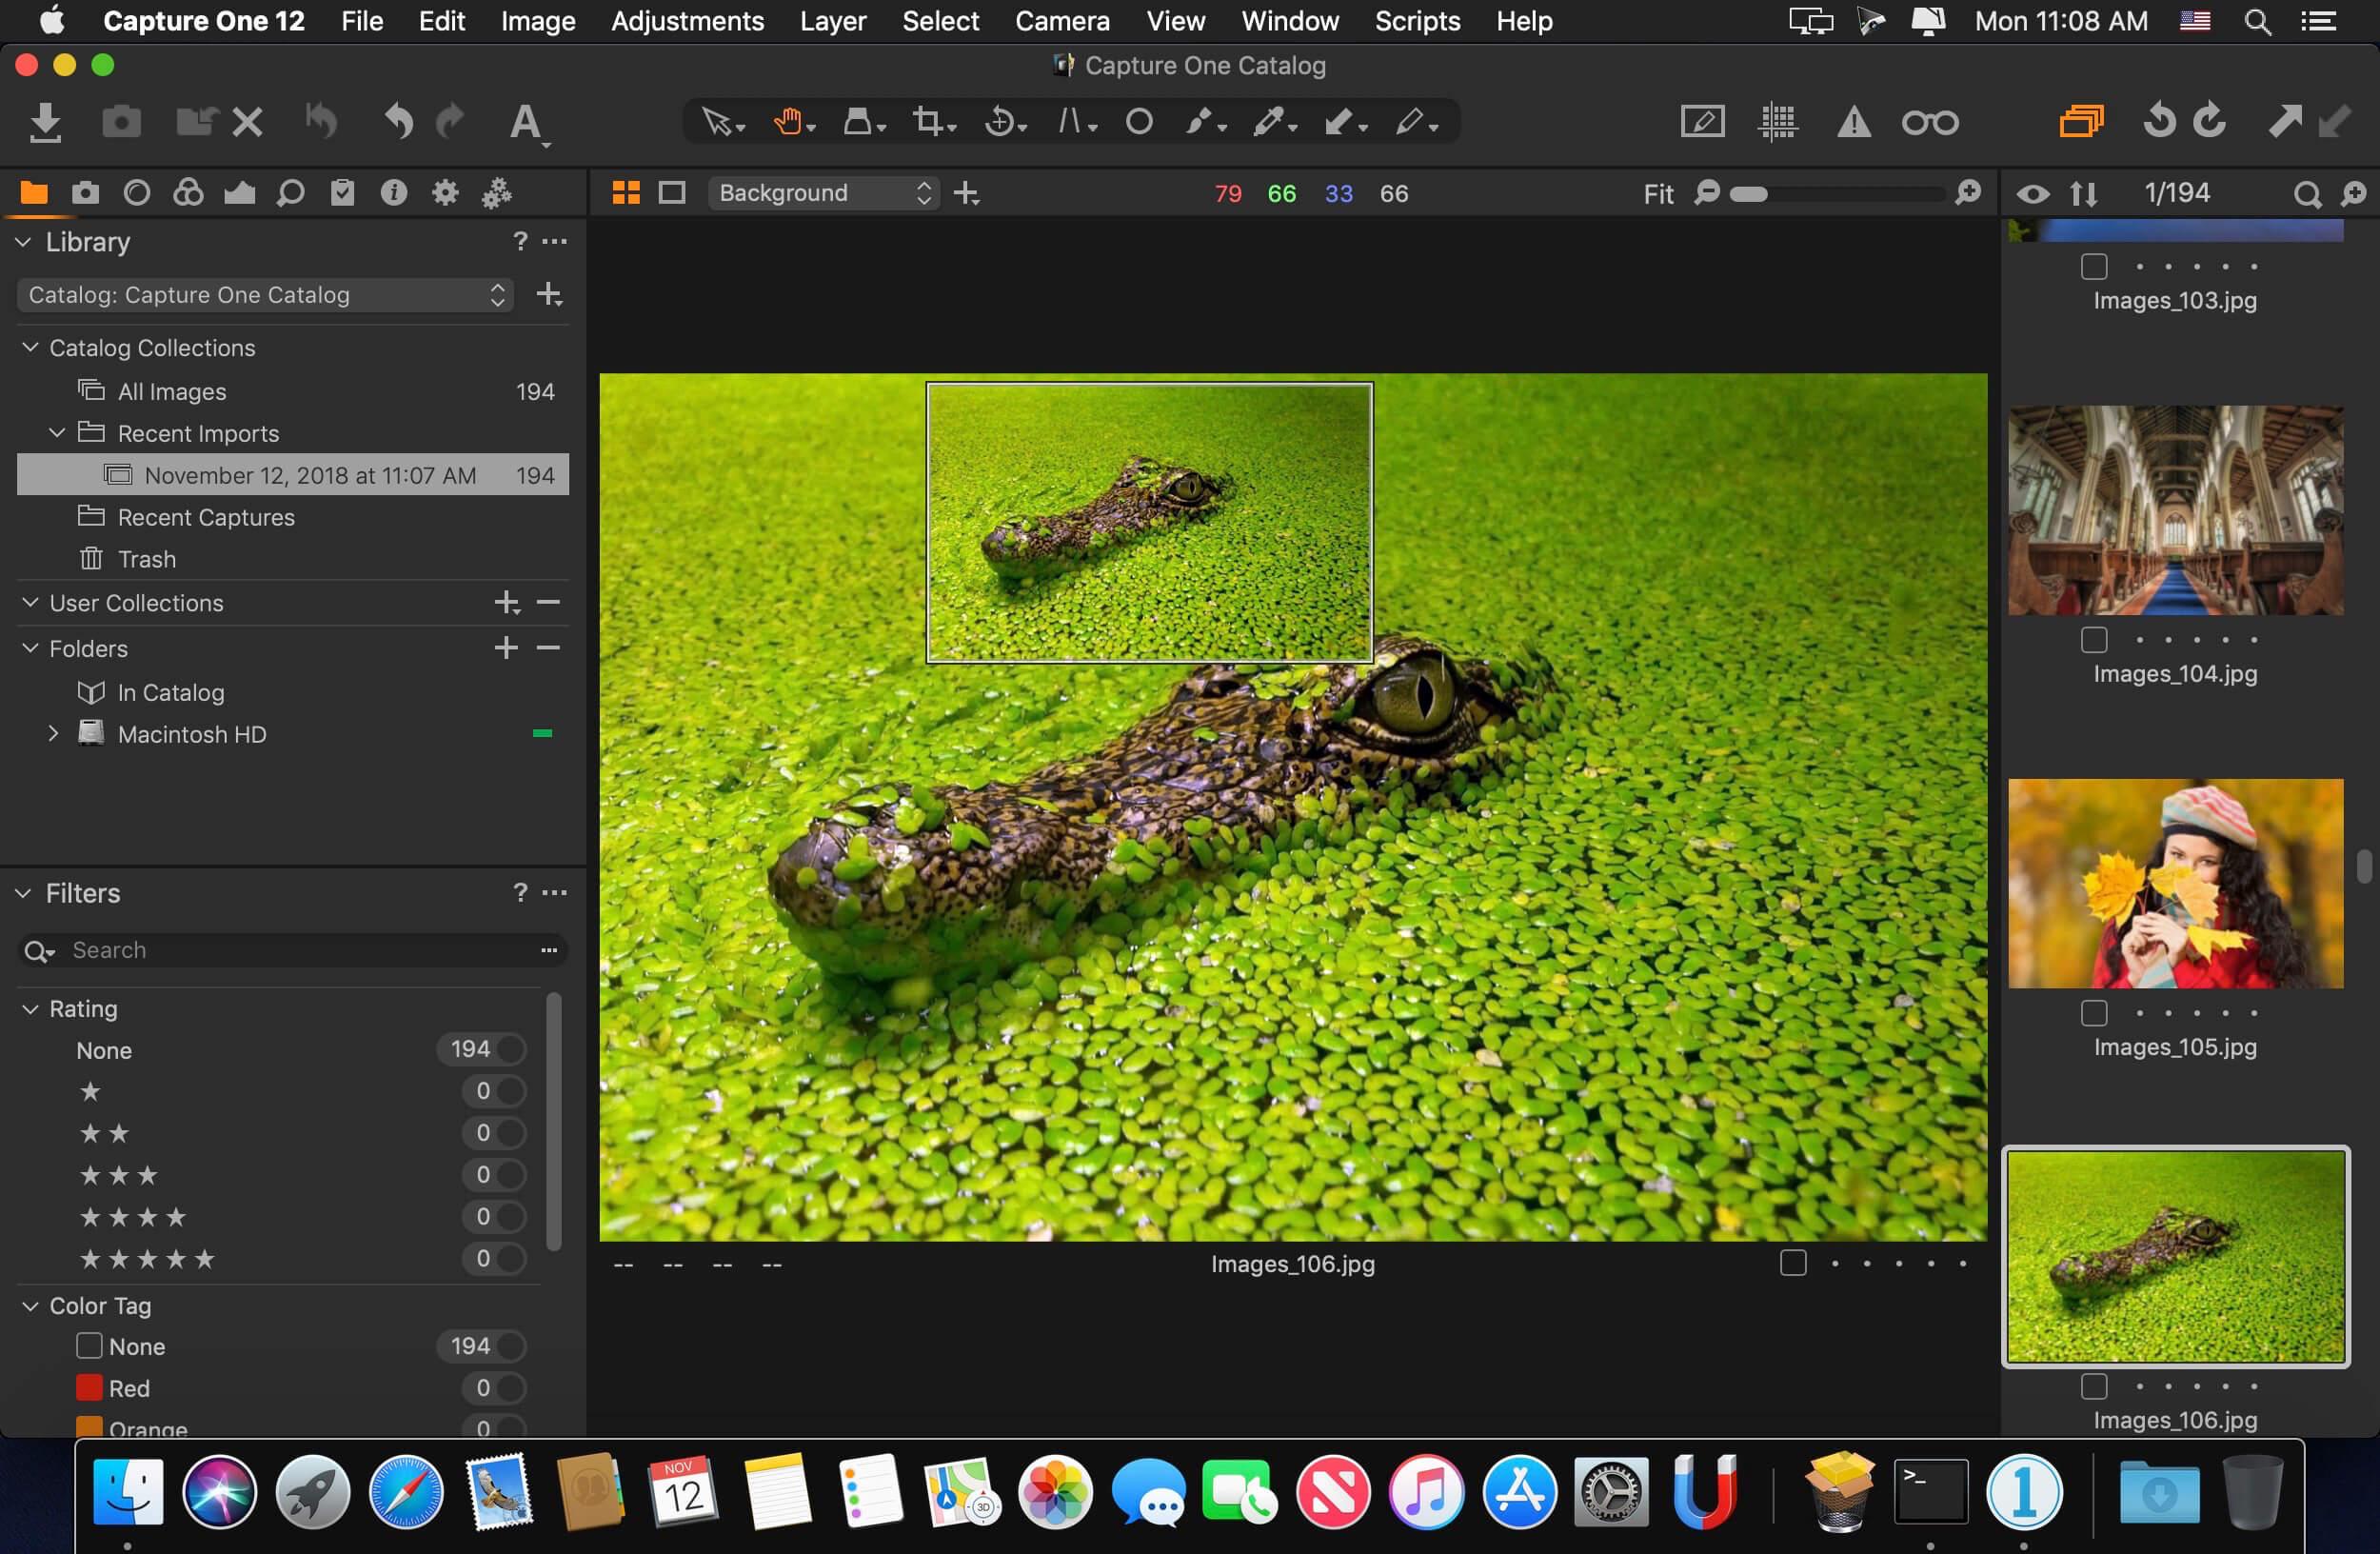 Capture One Pro 12 1 0 150 download | macOS